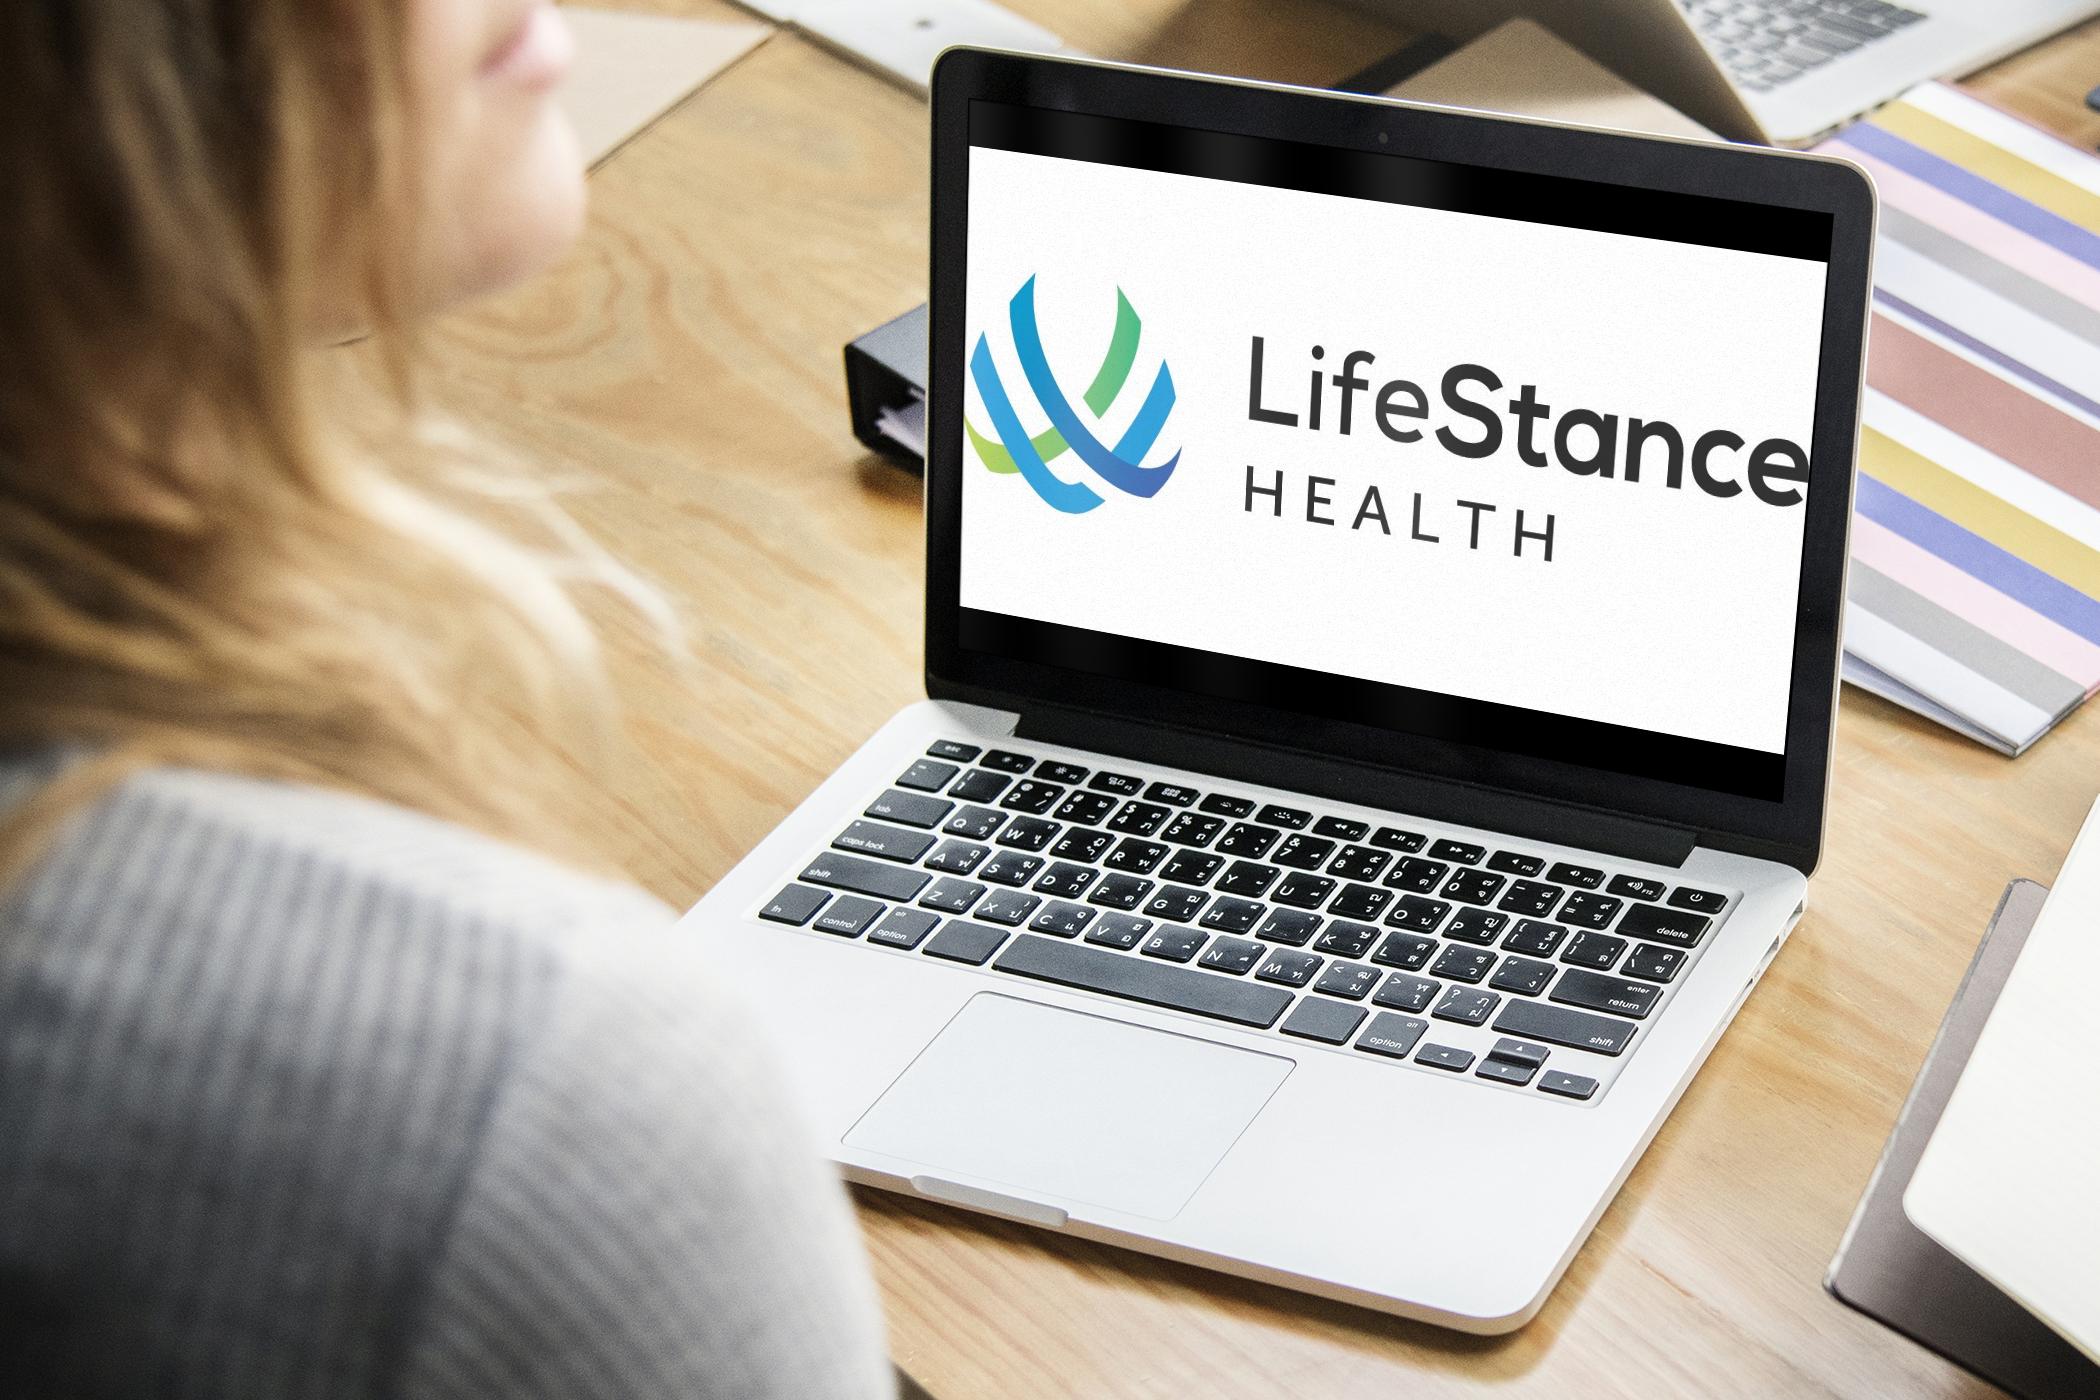 LifeStance Initial Public Offering